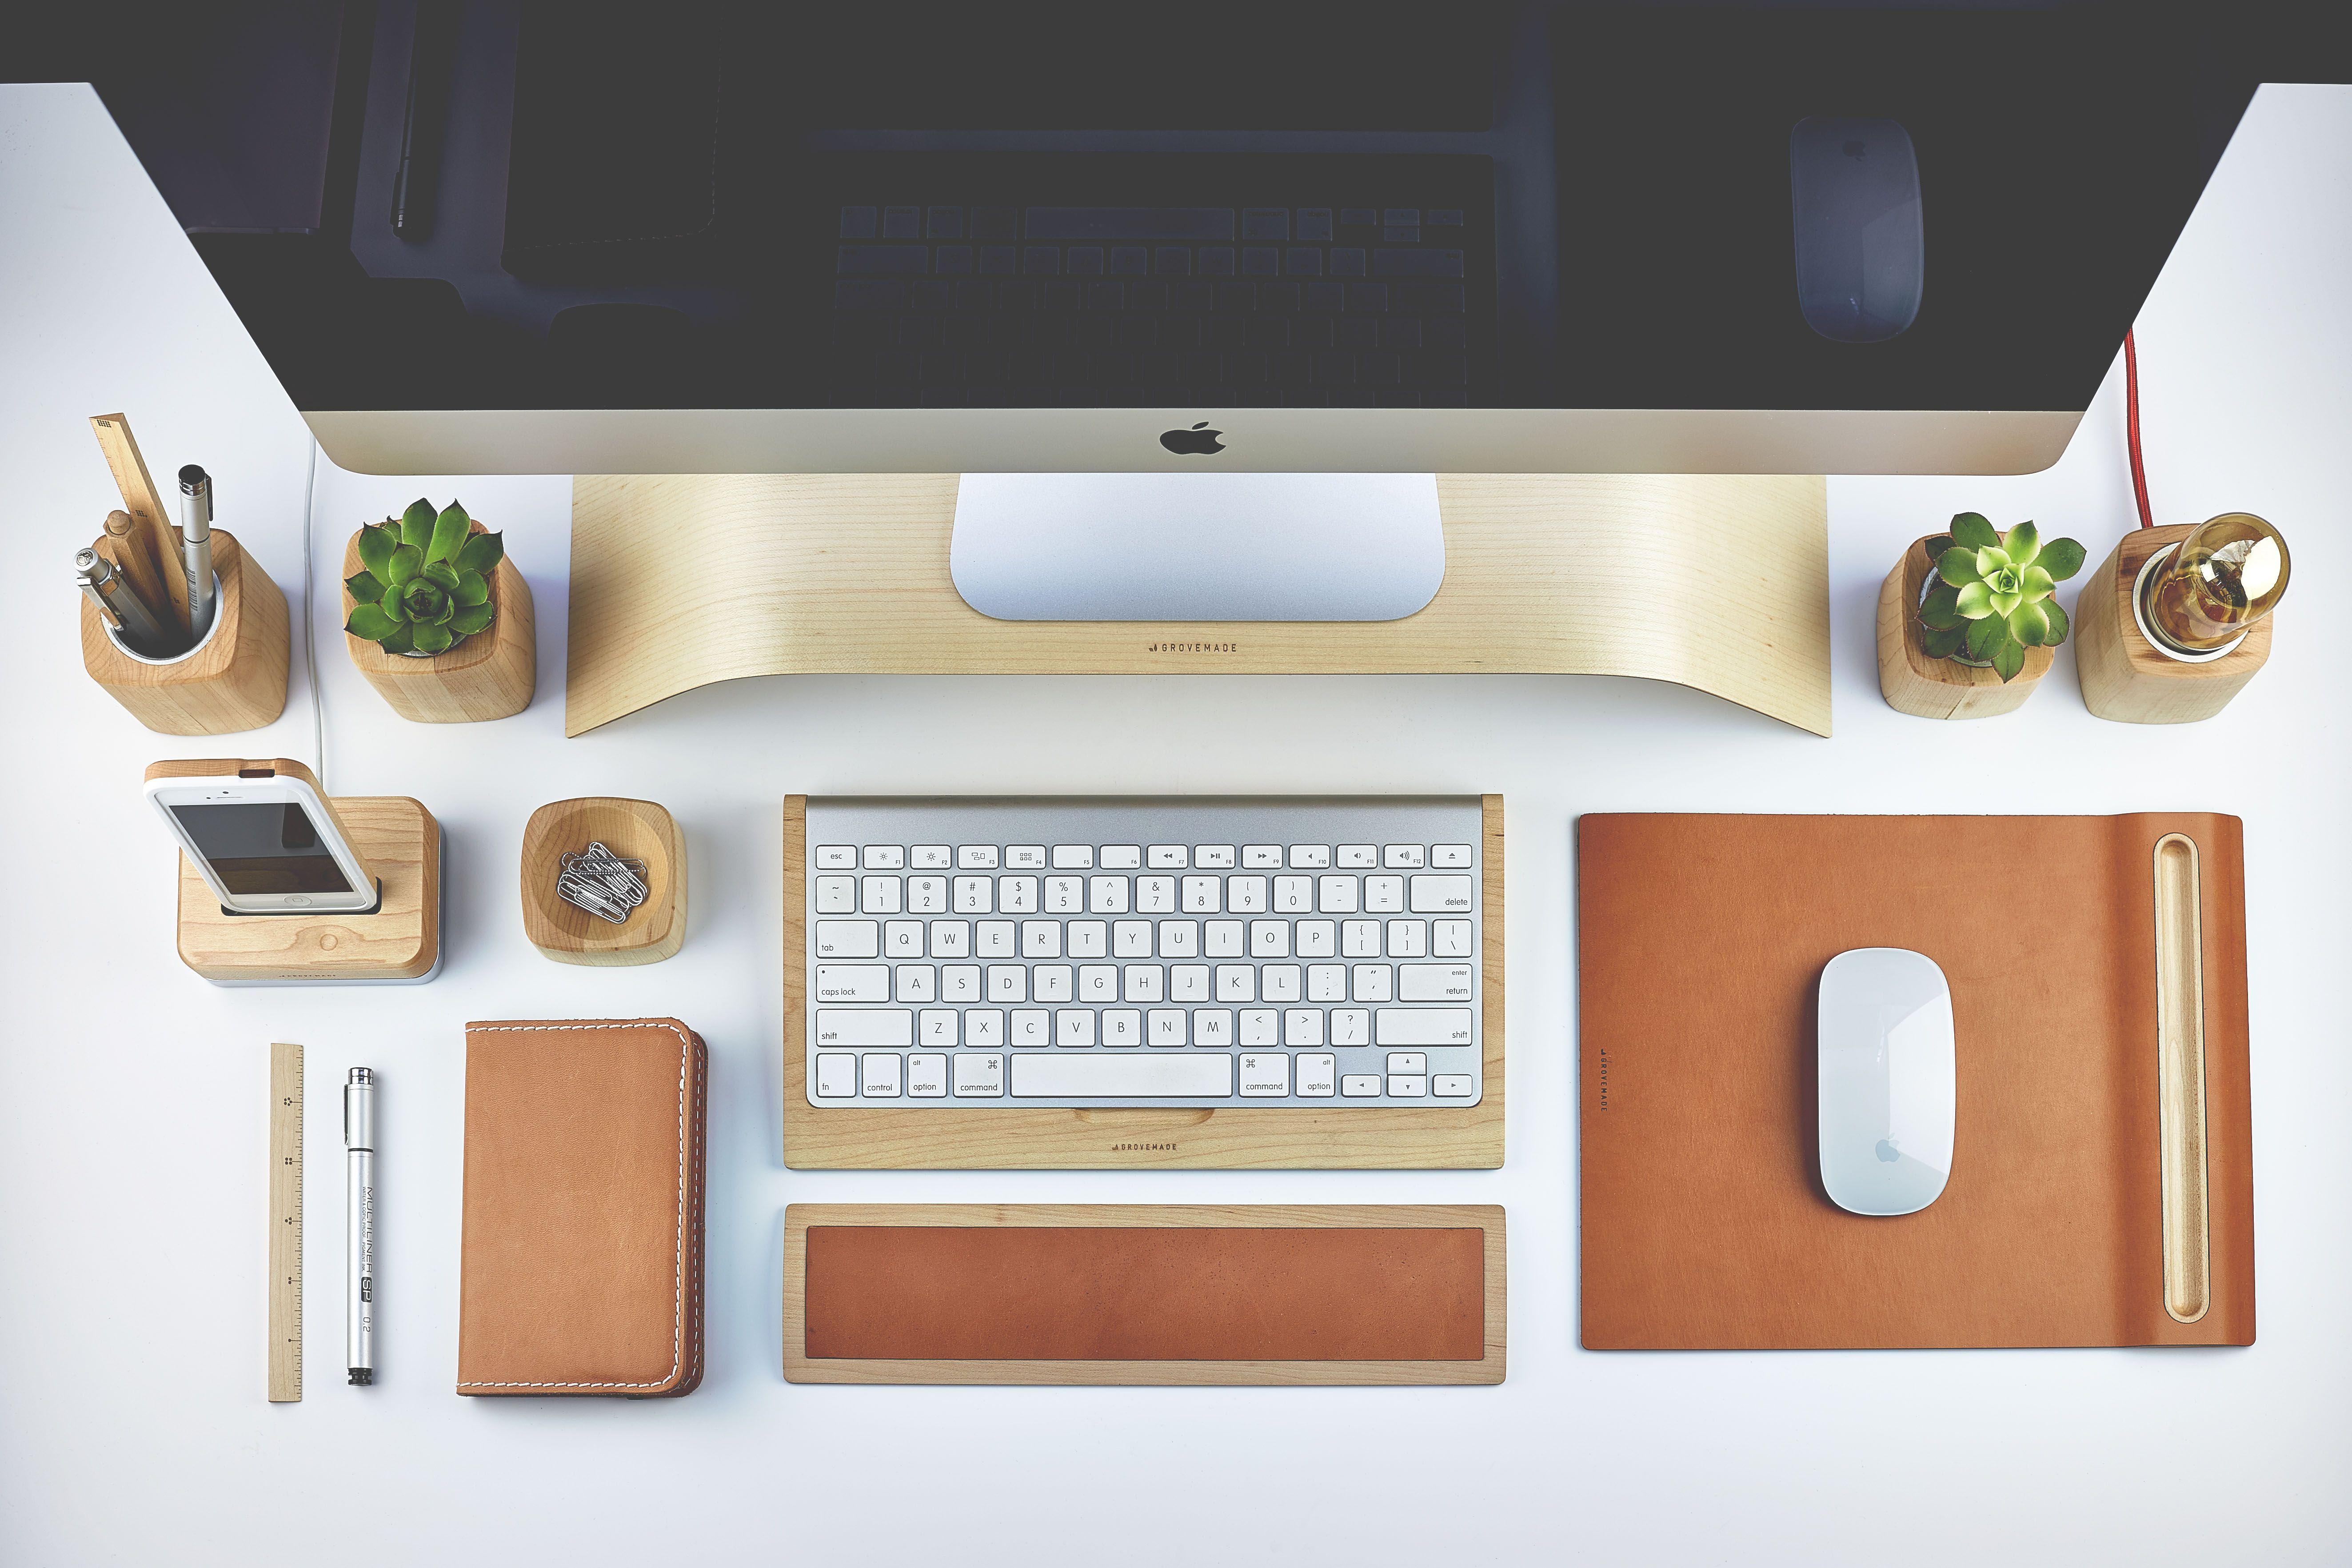 Grovemade S Line Of Desk Accessories